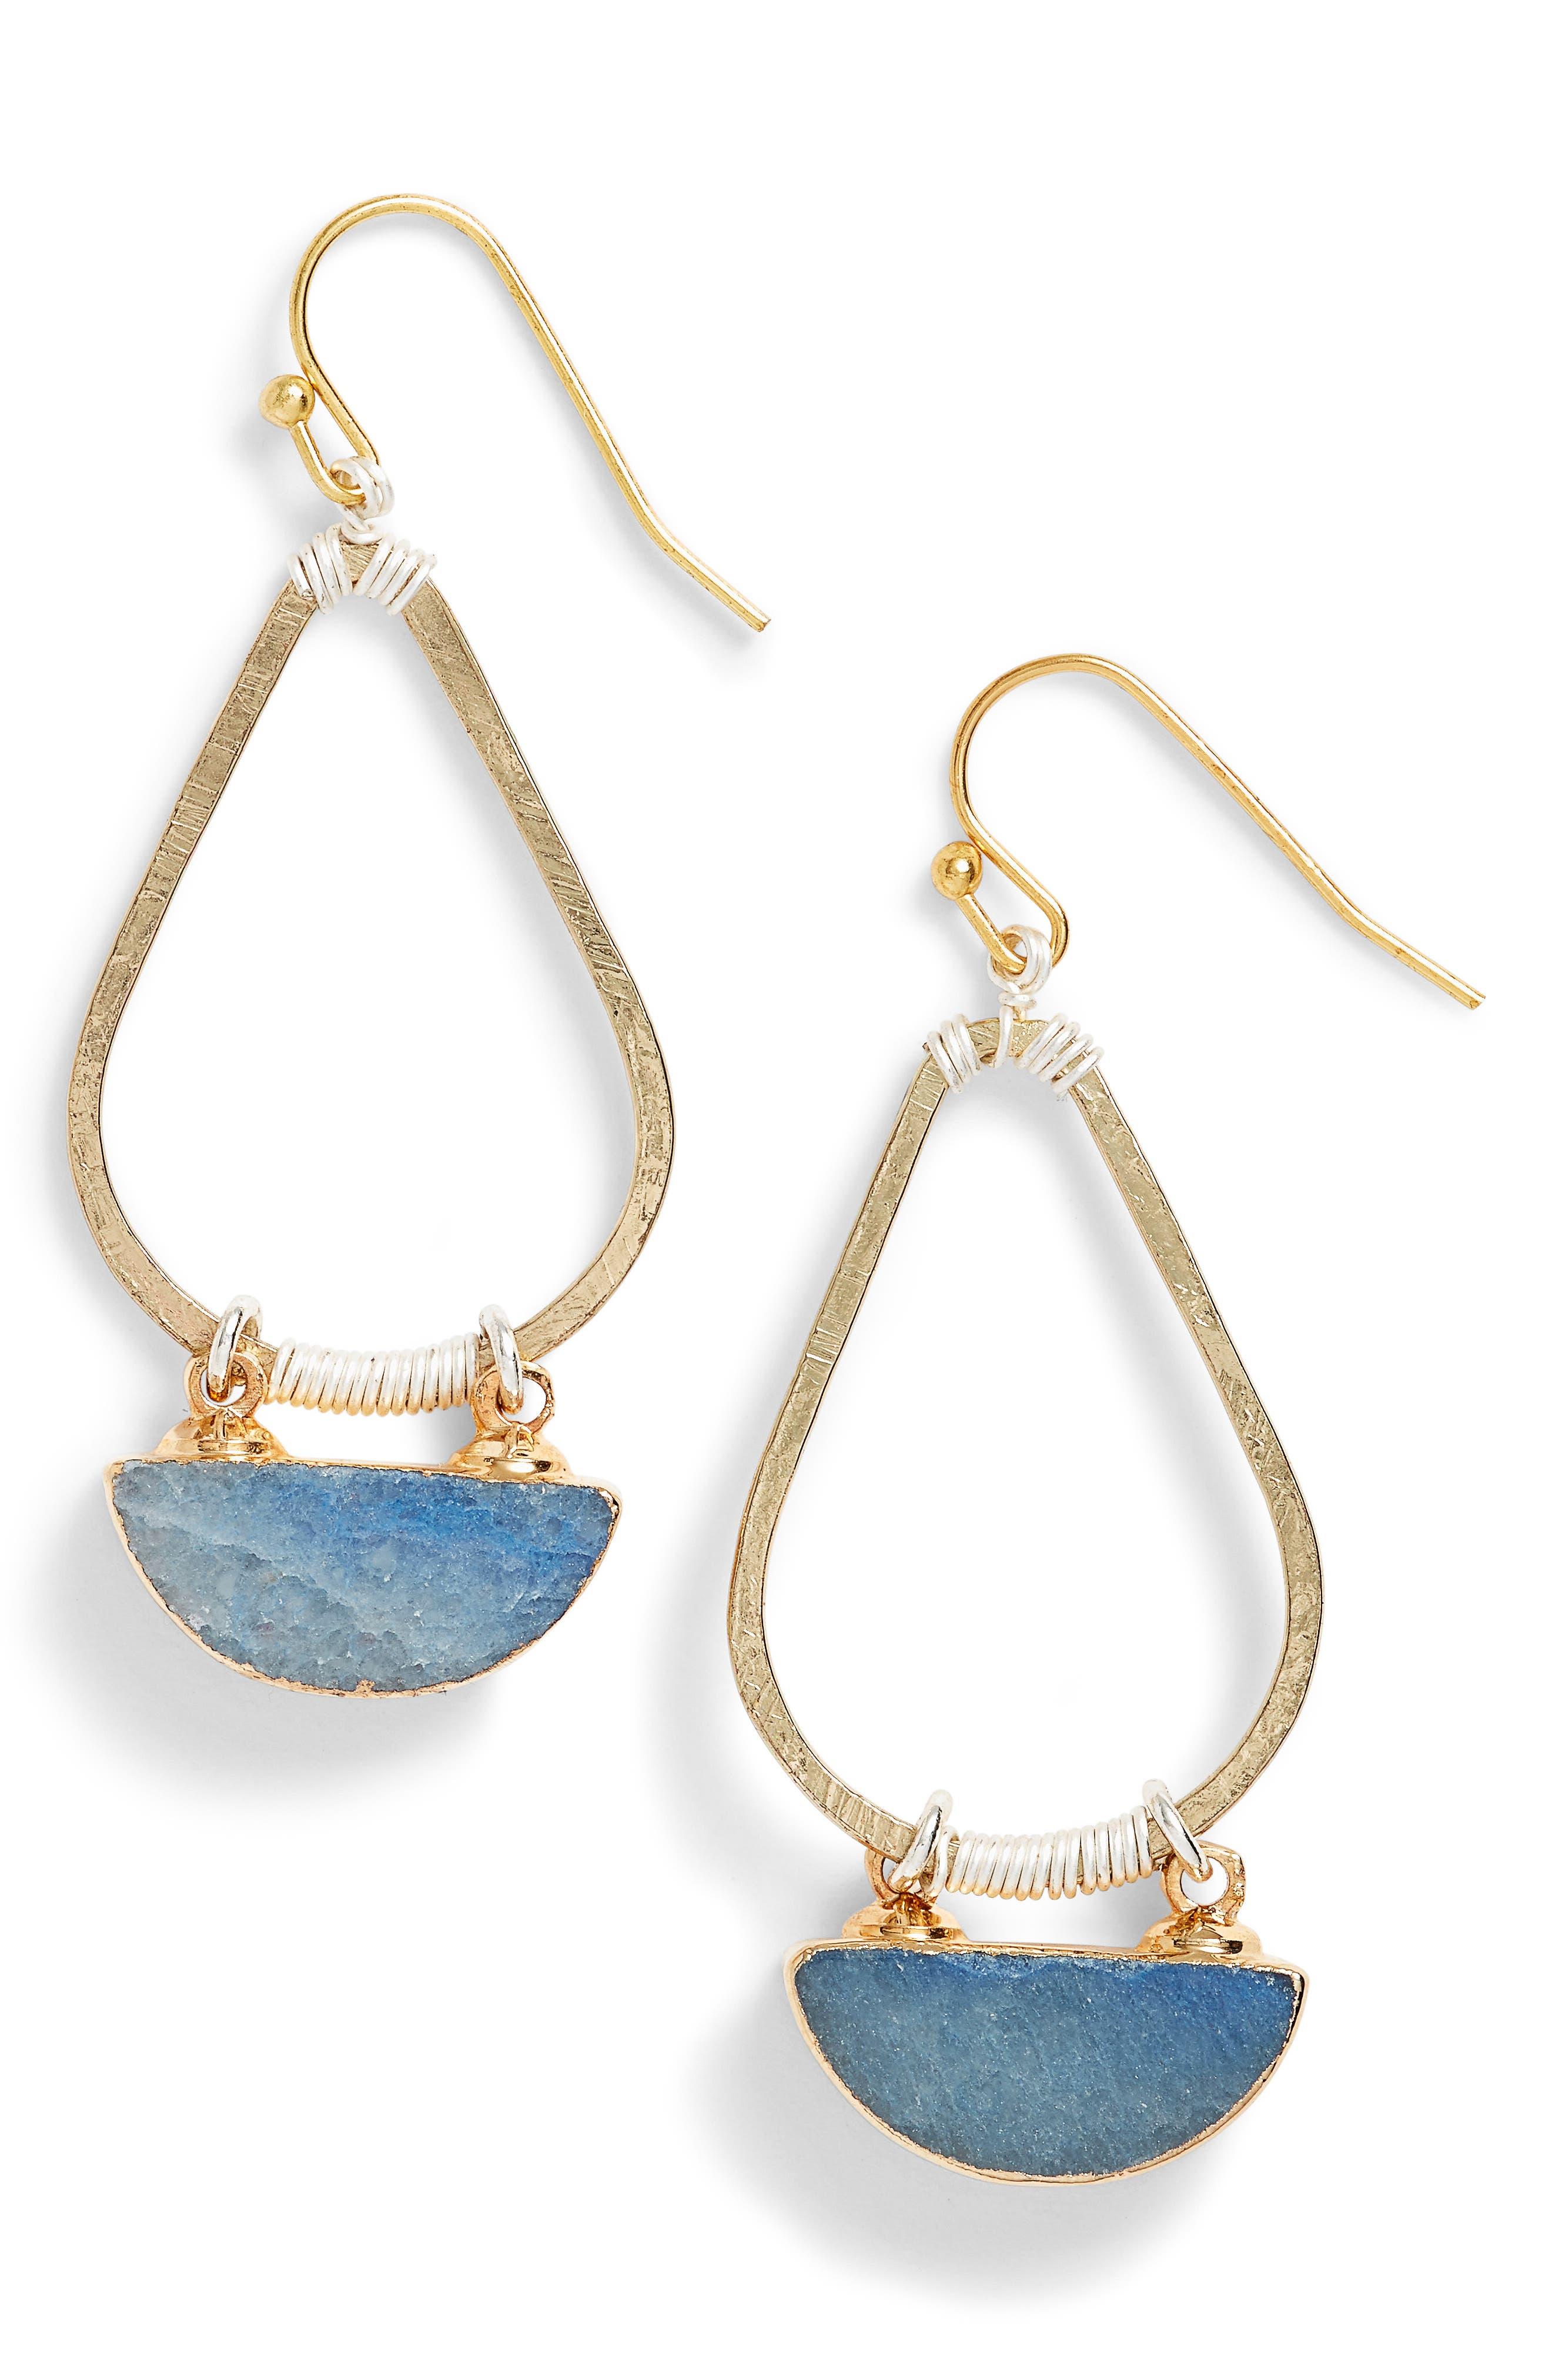 Main Image - Nakamol Design Bahar Lapis Teardrop Earrings